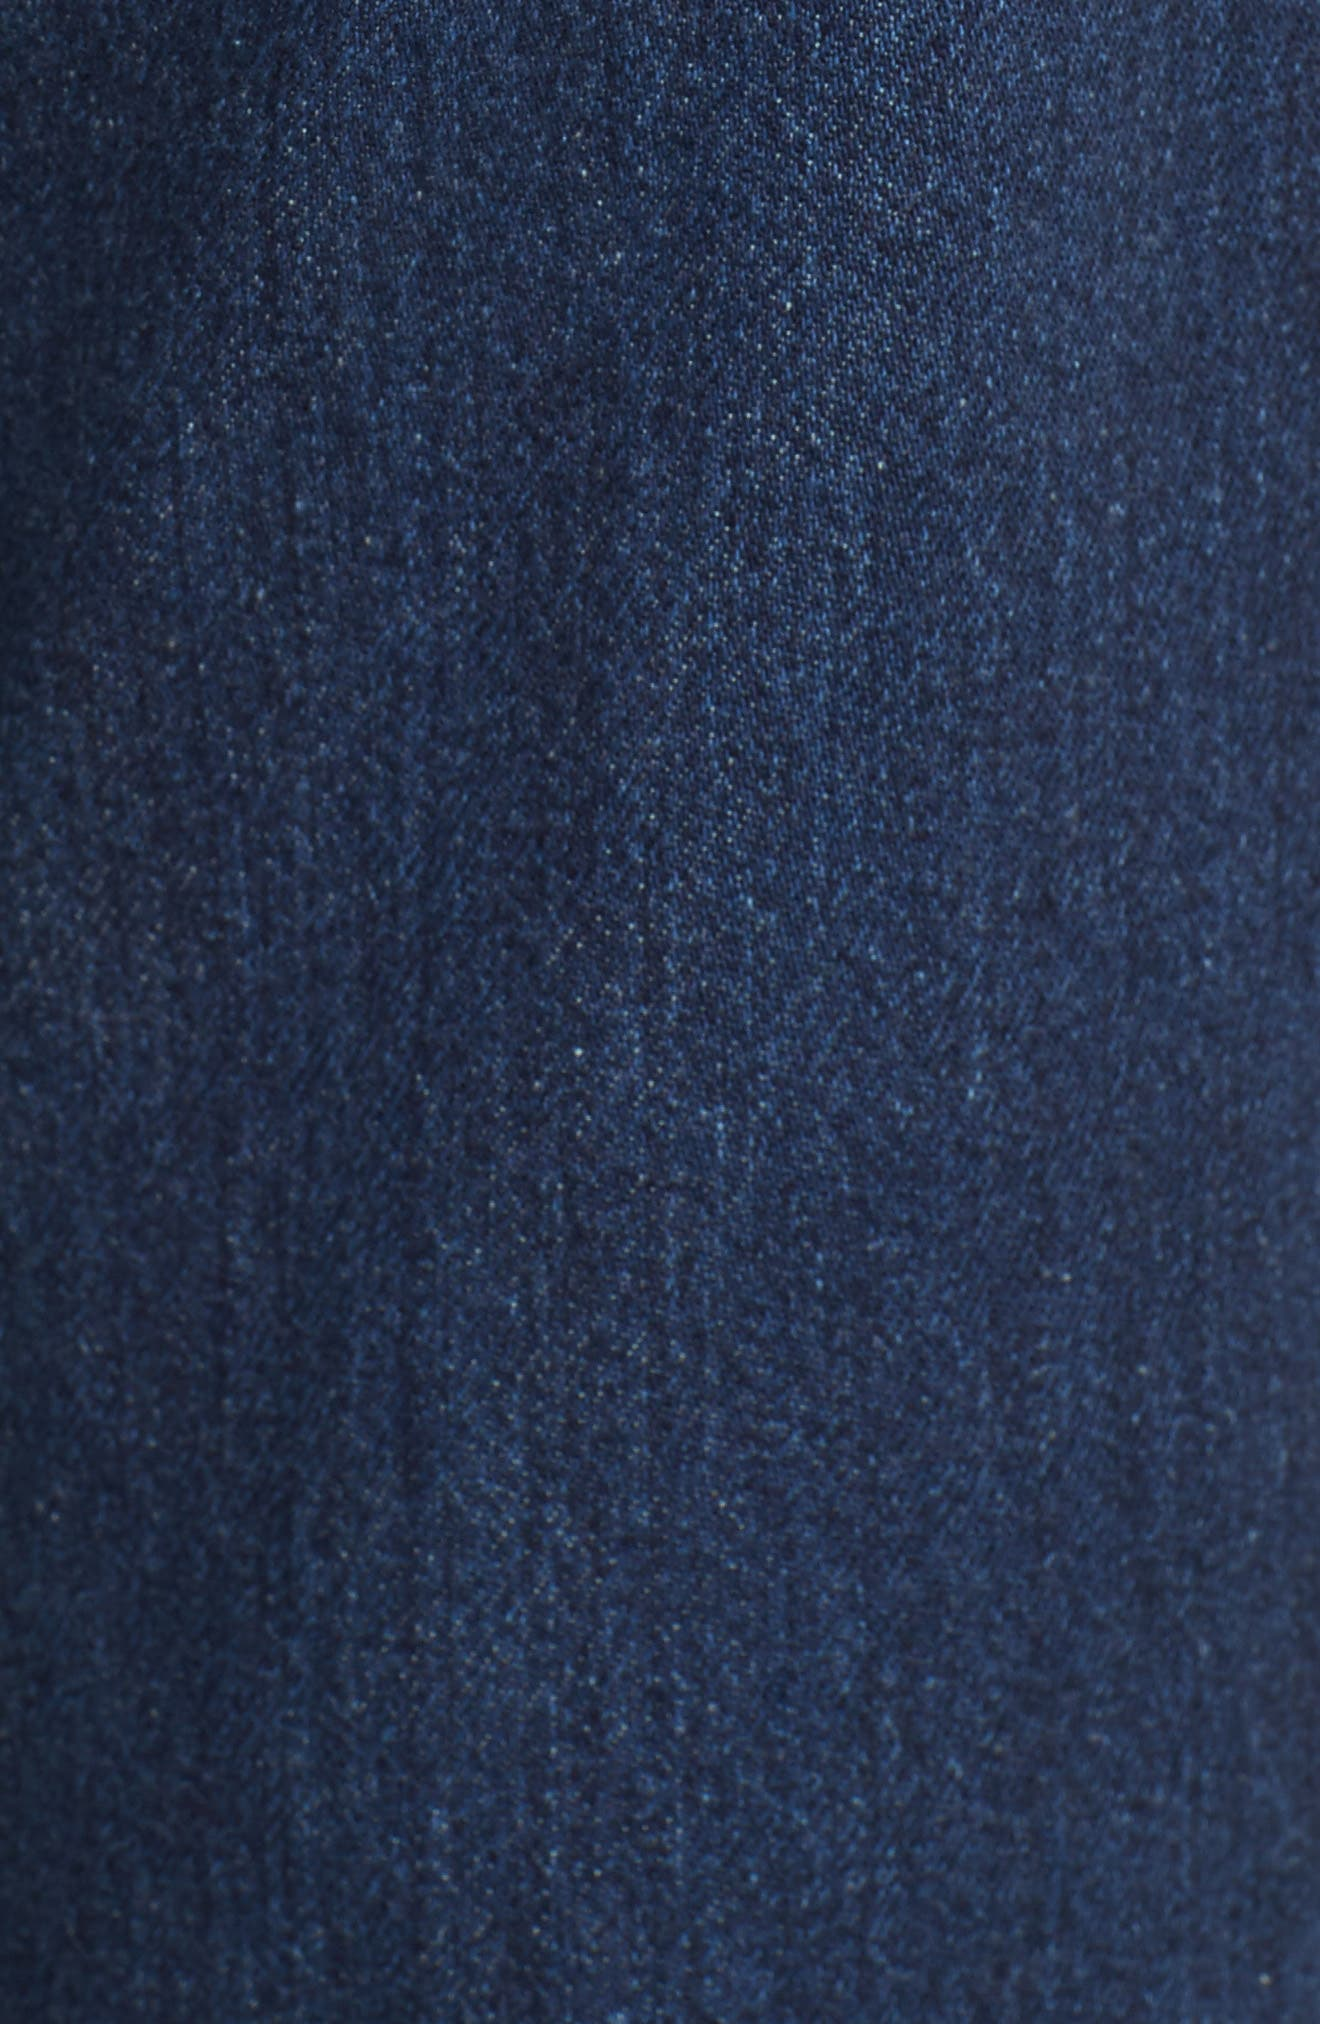 Marques'Almeida Button Trim Crop Flare Jeans,                             Alternate thumbnail 5, color,                             420